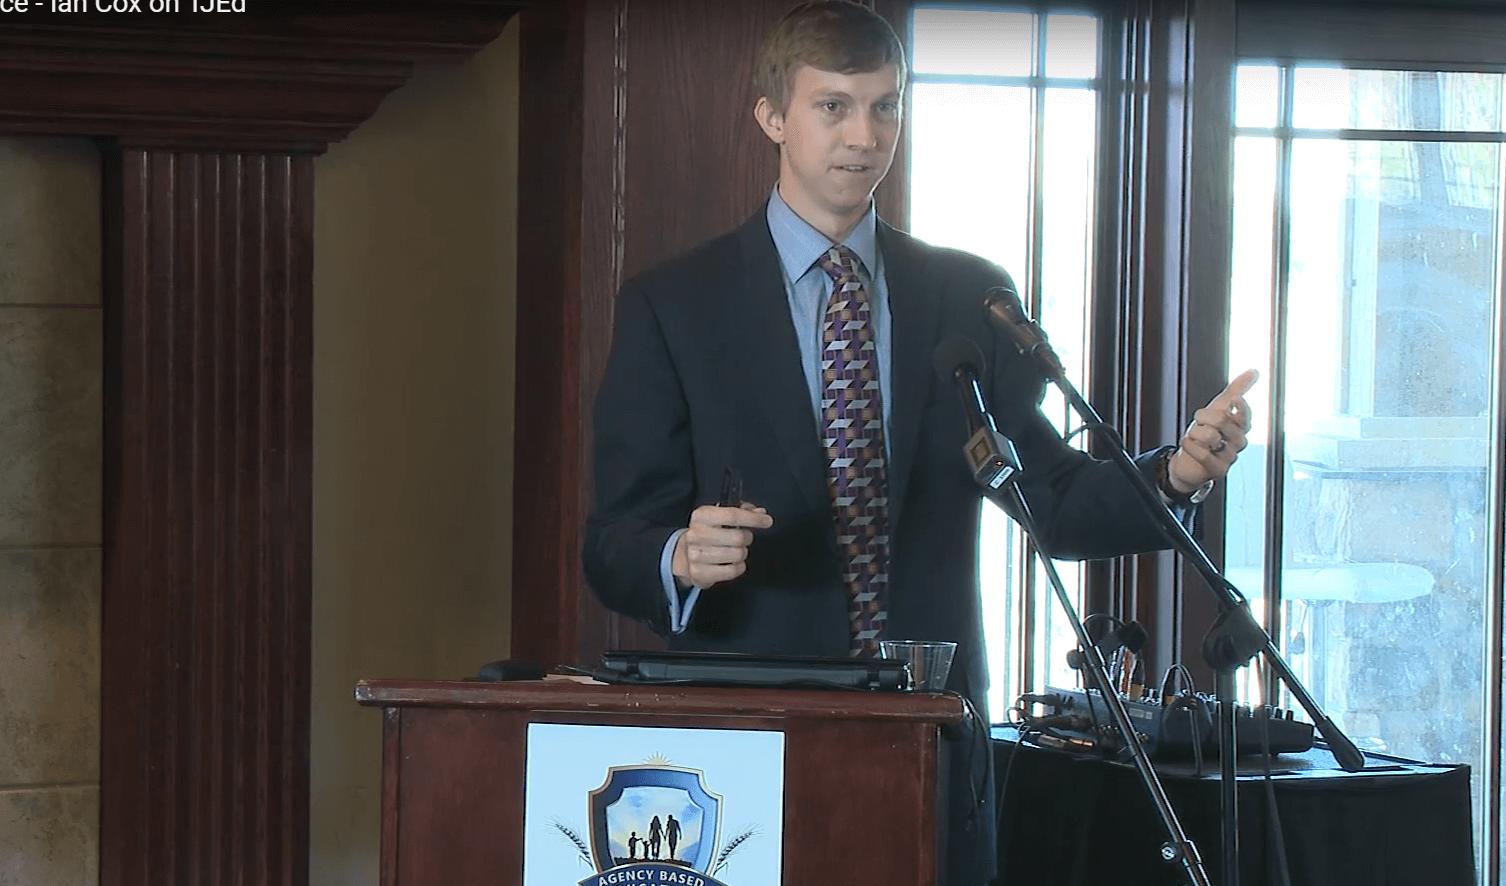 Ian Cox on his Thomas Jefferson Education